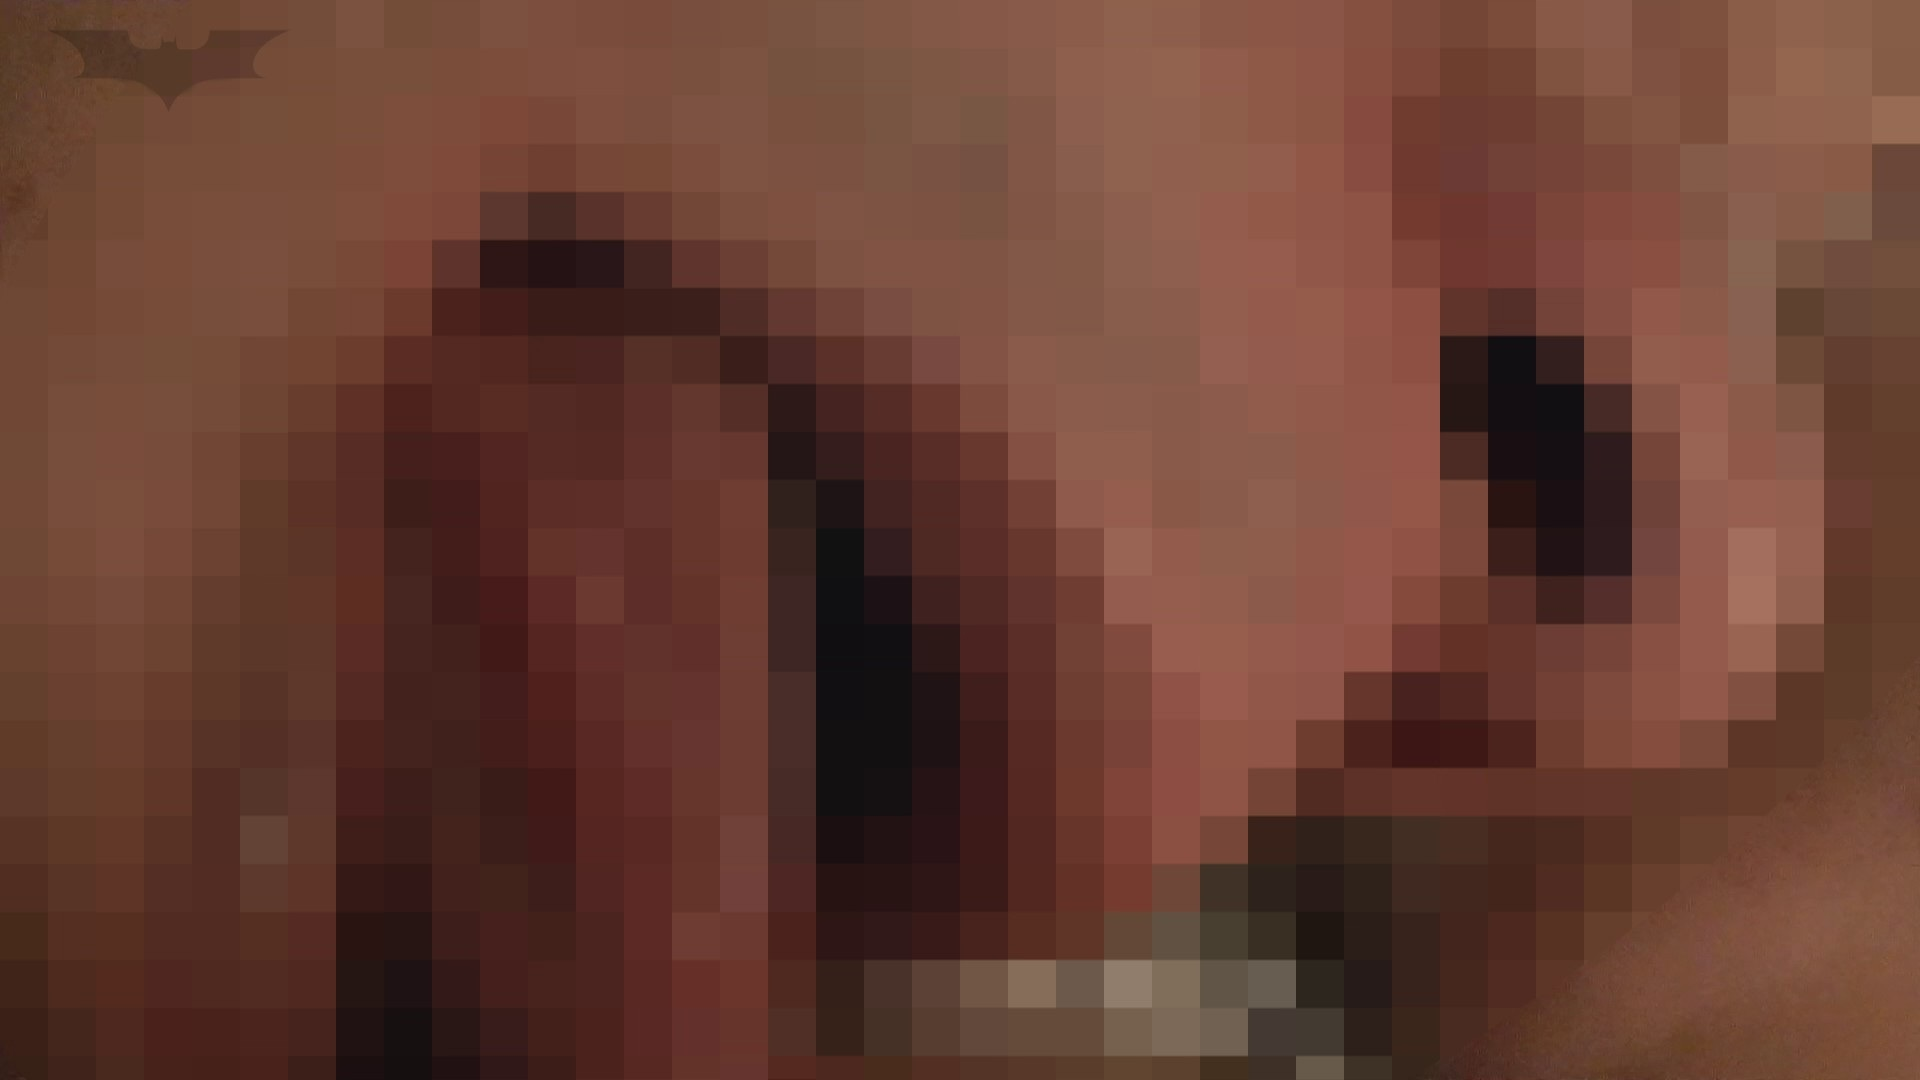 期間限定闇の花道Vol.07 影対姪っ子絶対ダメな調教関係Vol.01 高画質 濡れ場動画紹介 91枚 59